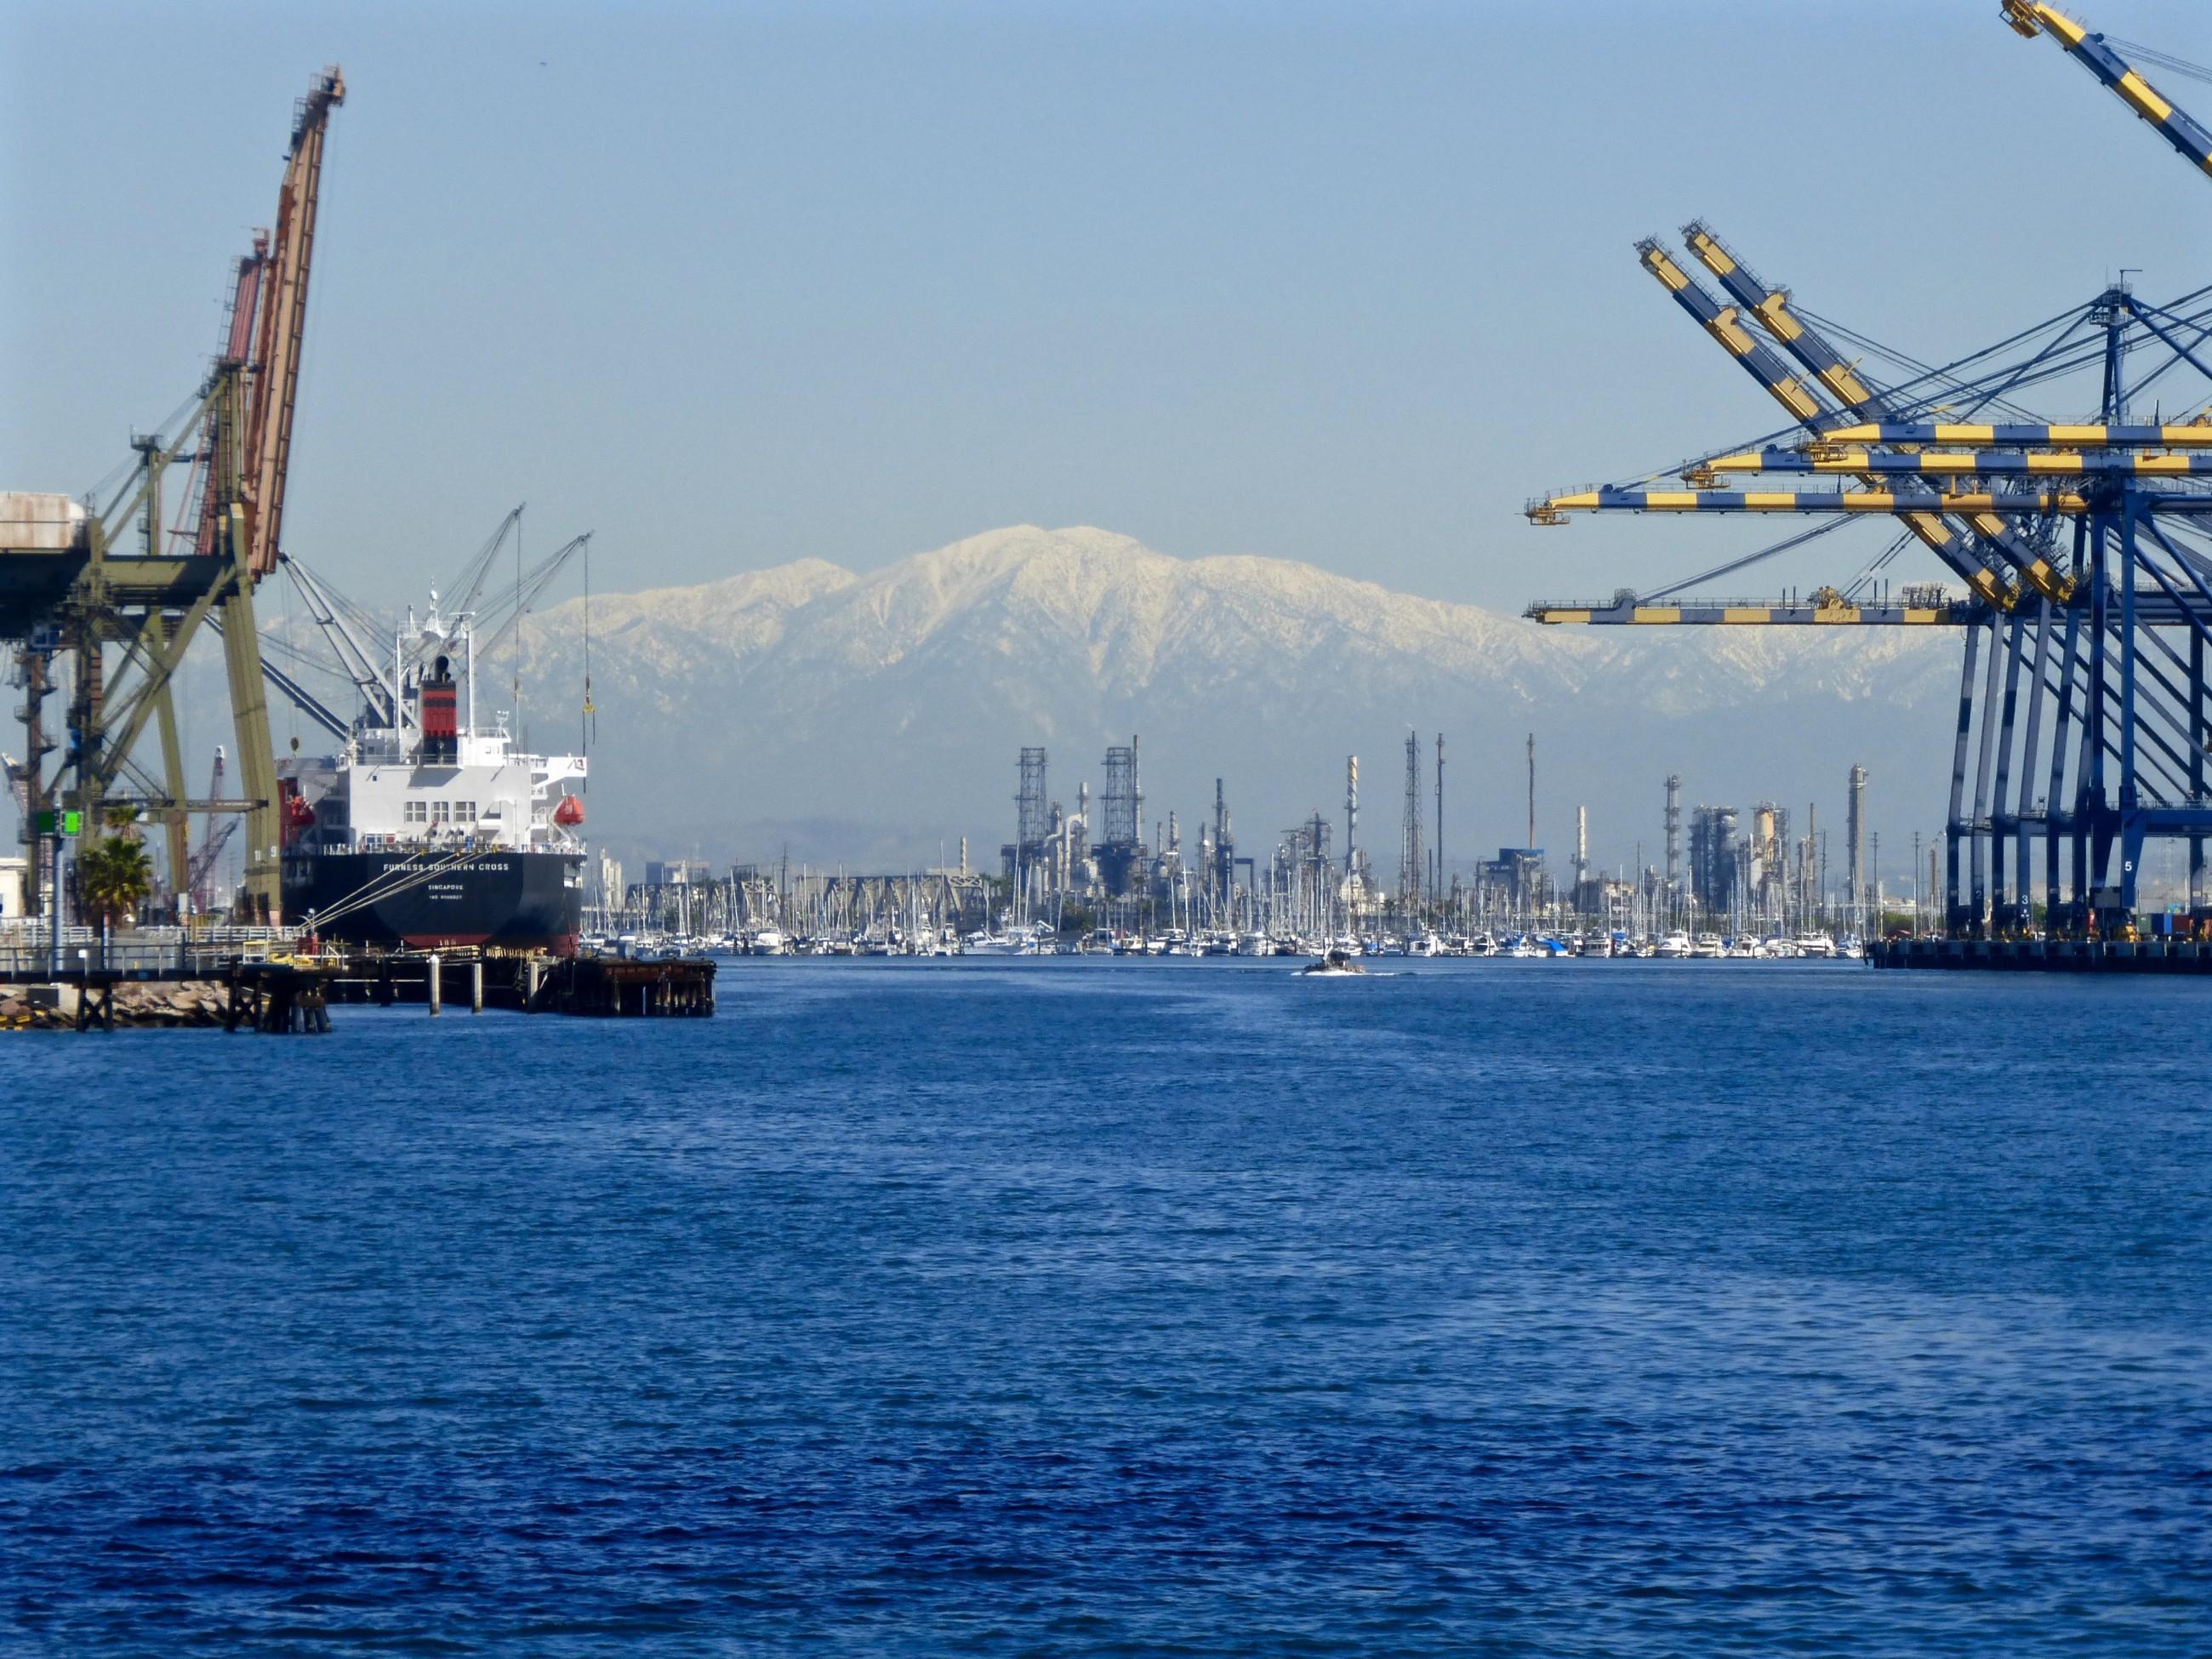 Los Angeles Maritime Museum/Port Of Los Angeles Tour - San